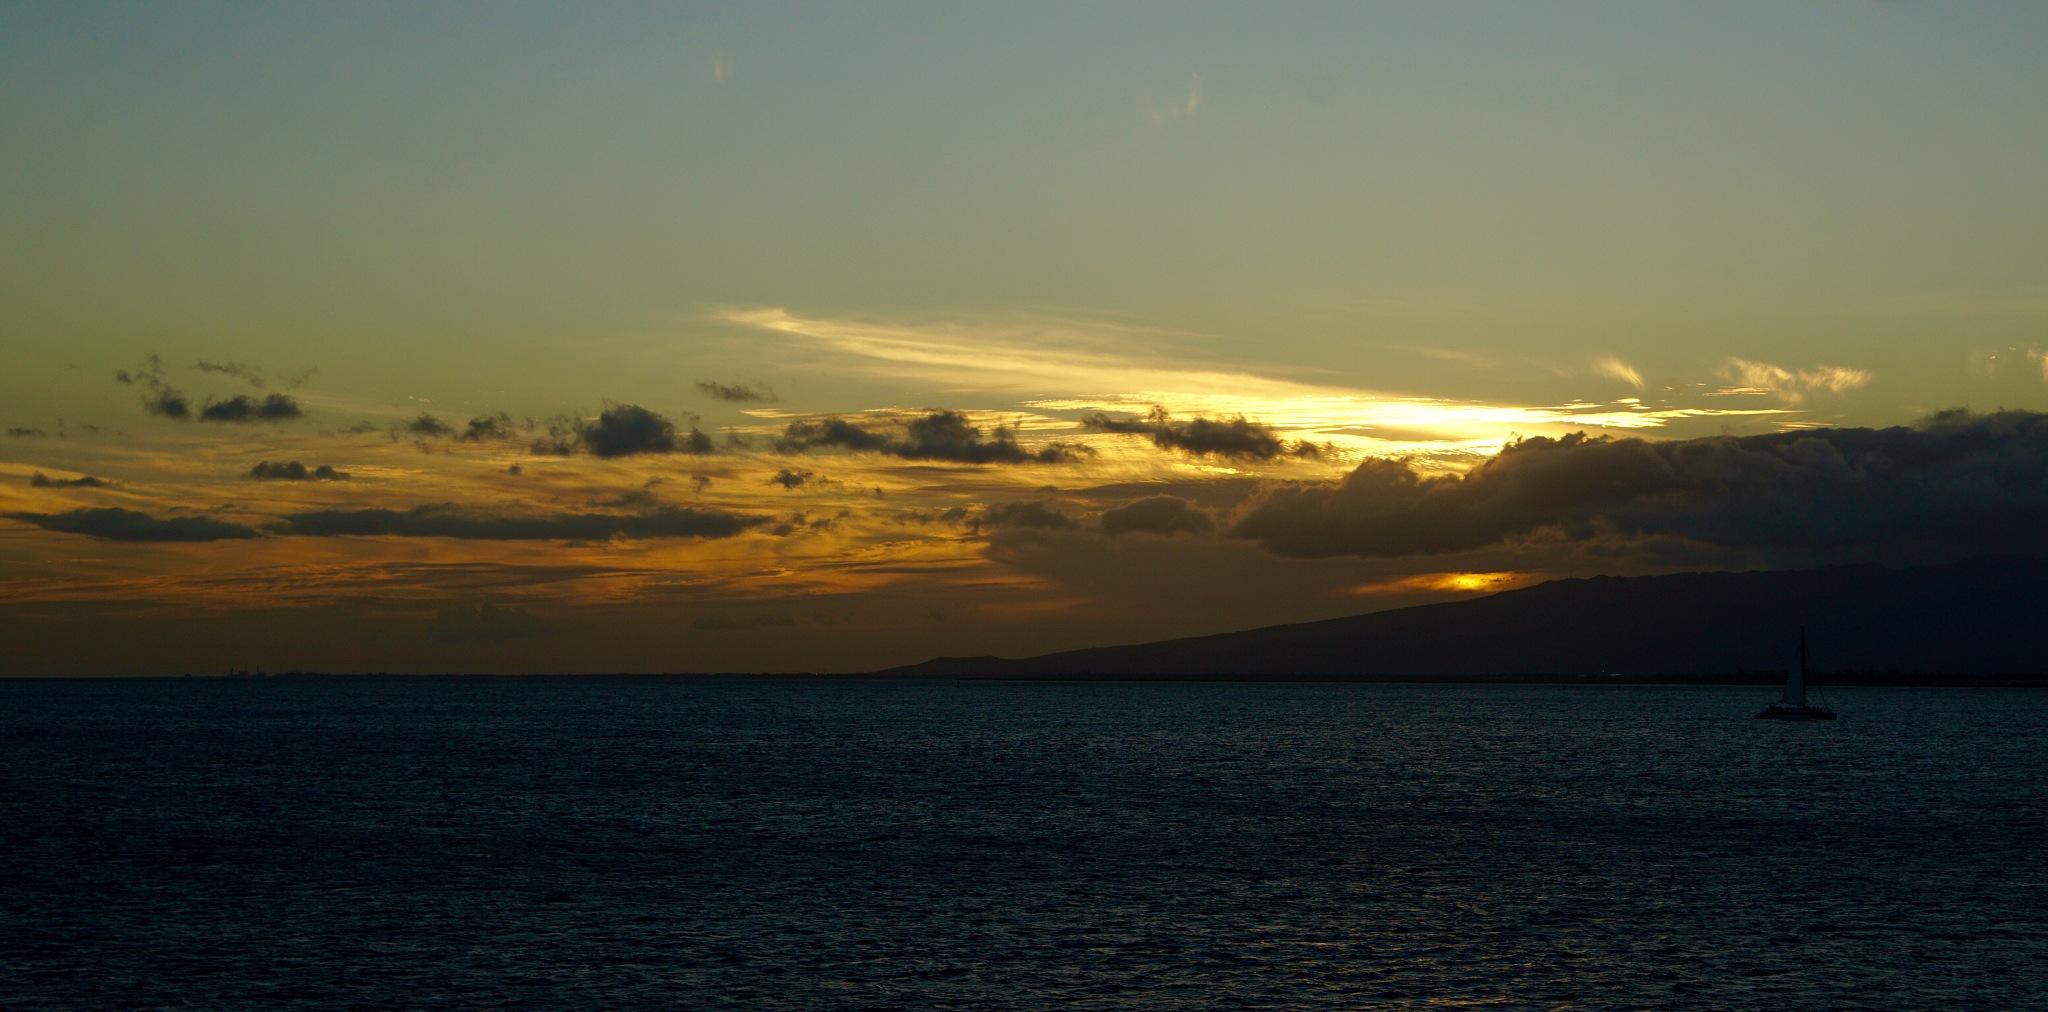 Island sunset by havnfn